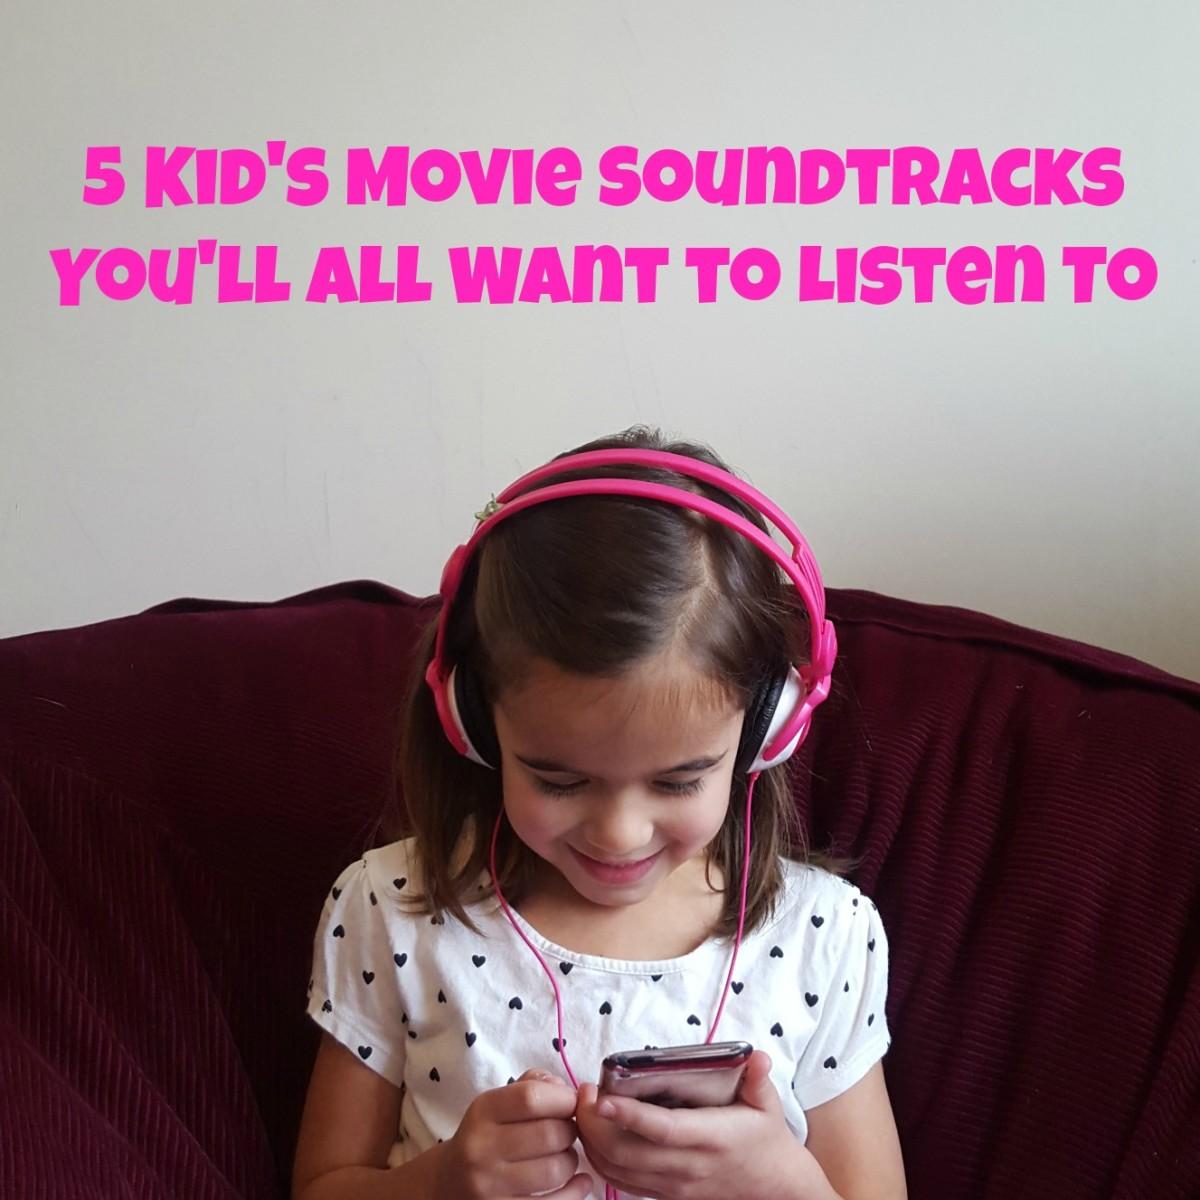 5 Kid's Movie Soundtracks